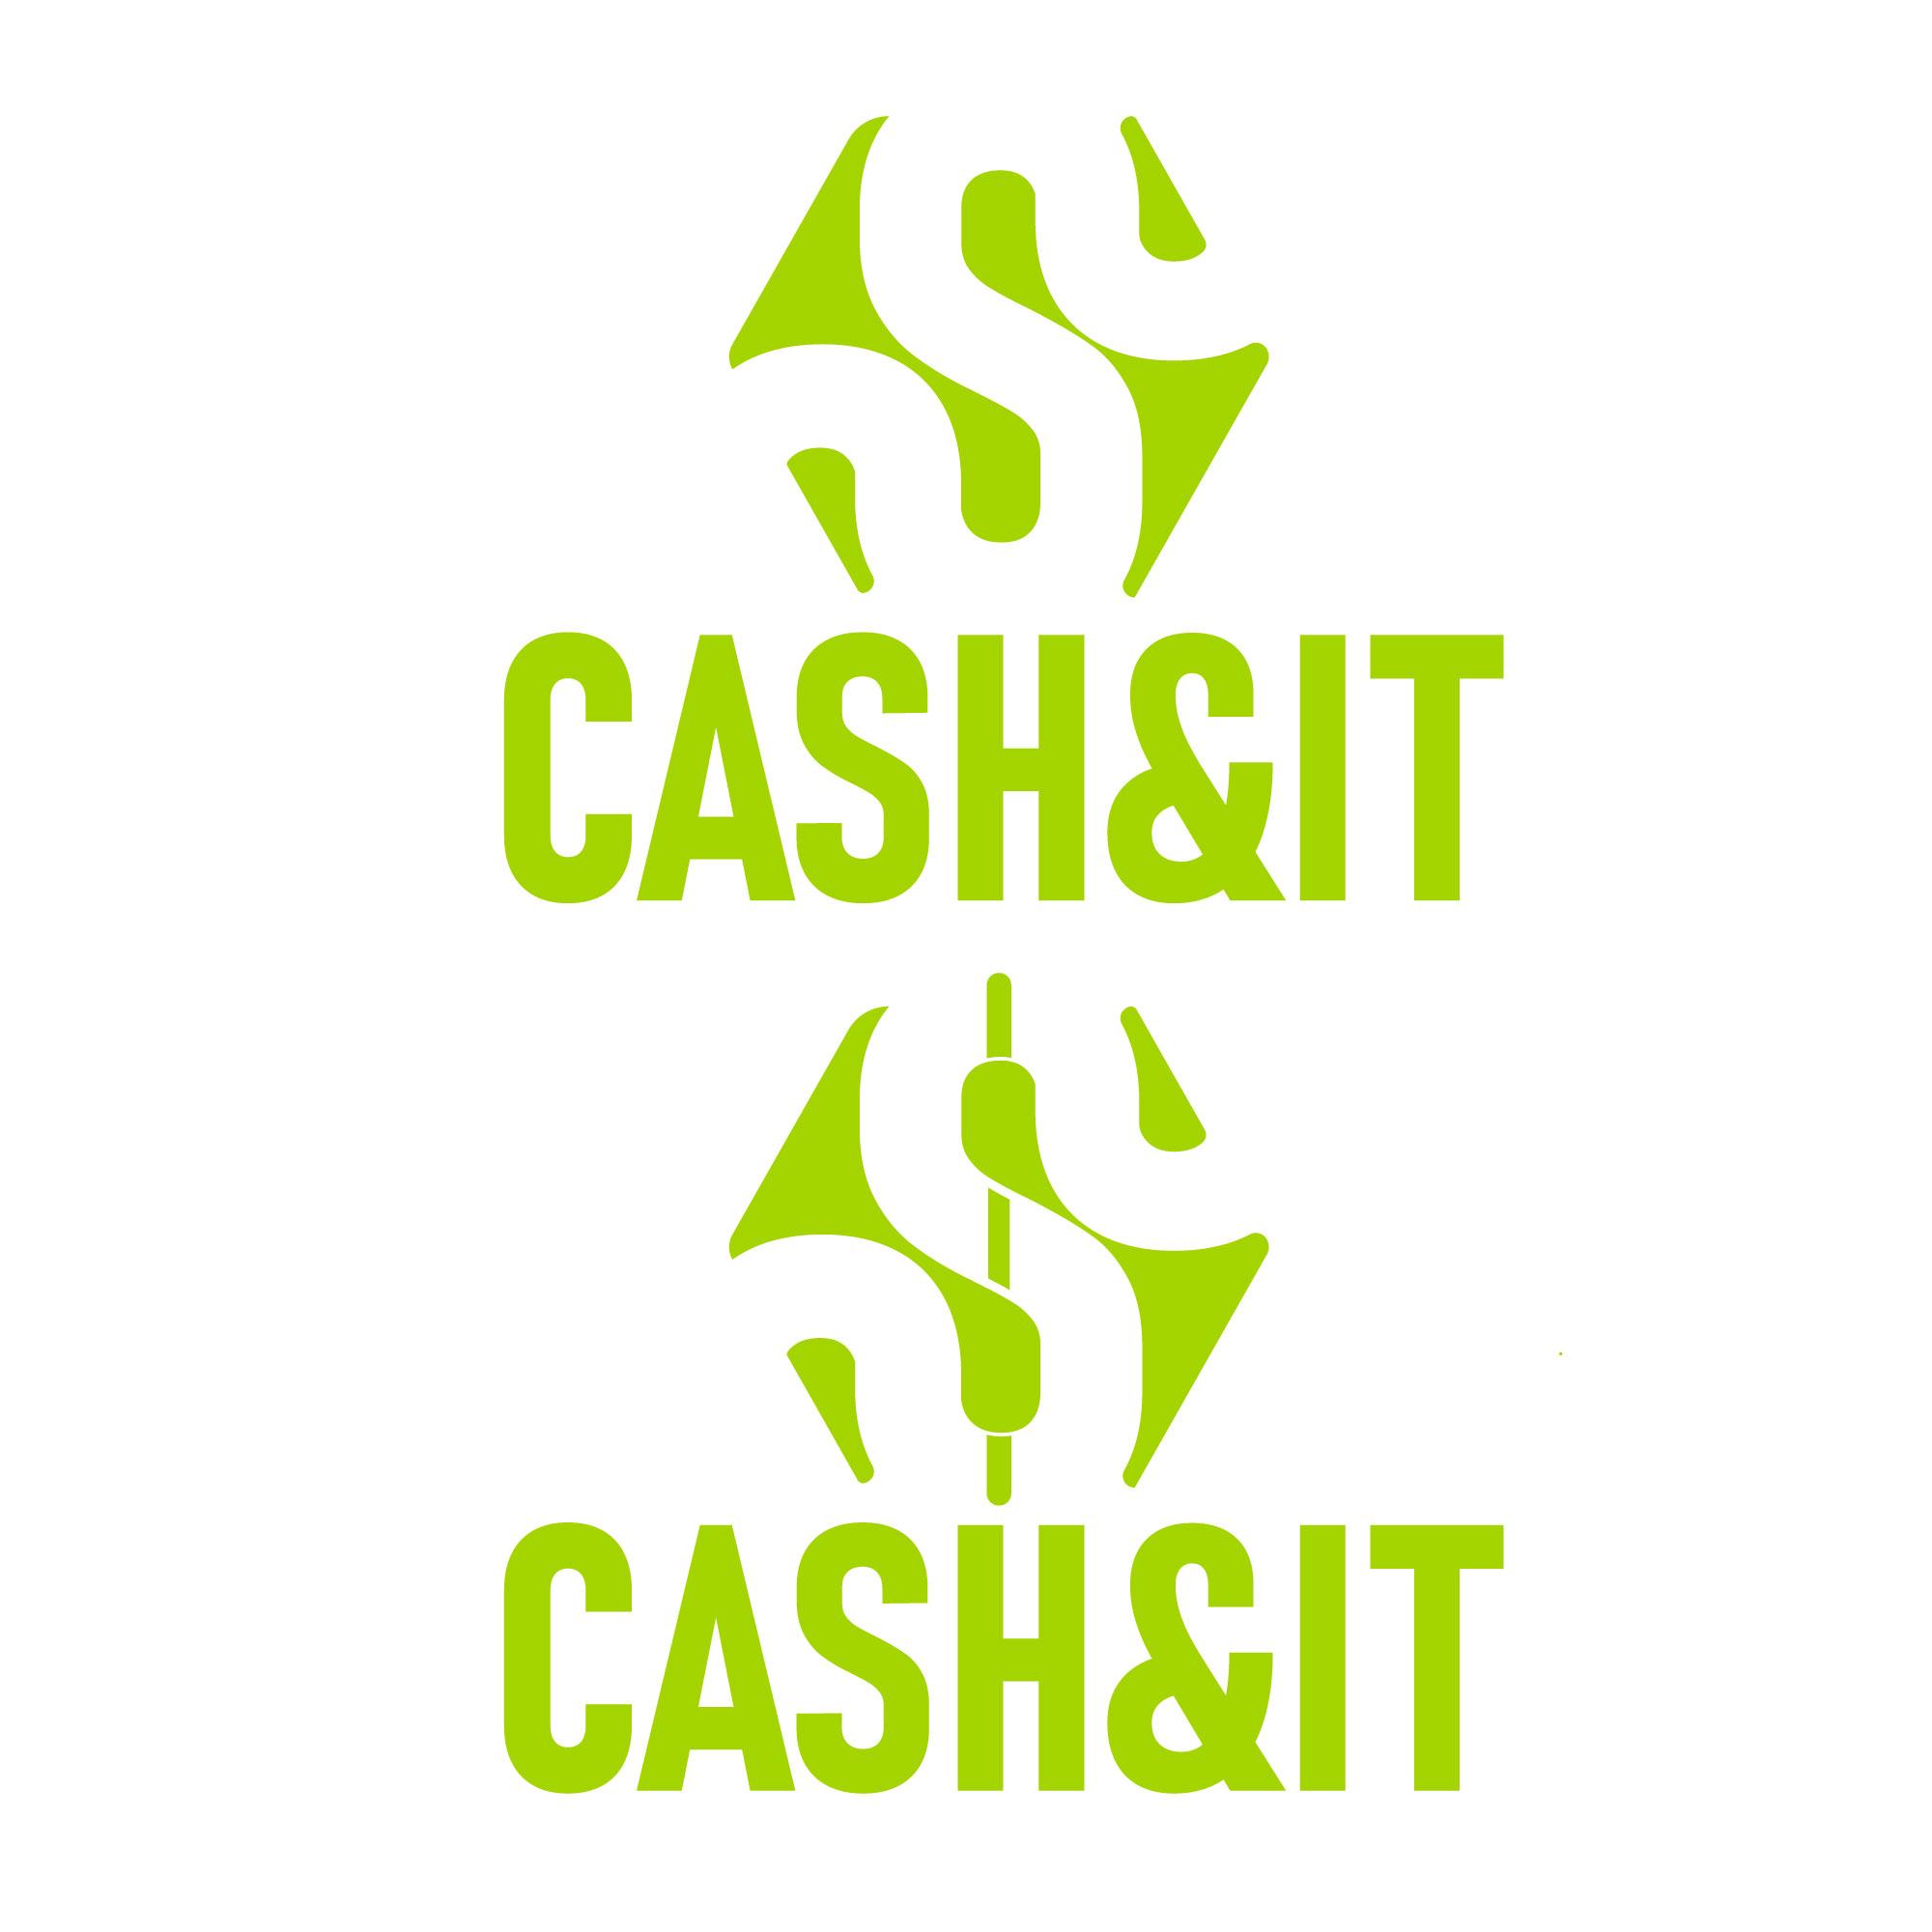 Логотип для Cash & IT - сервис доставки денег фото f_8185fdcf0cd58ea4.jpg